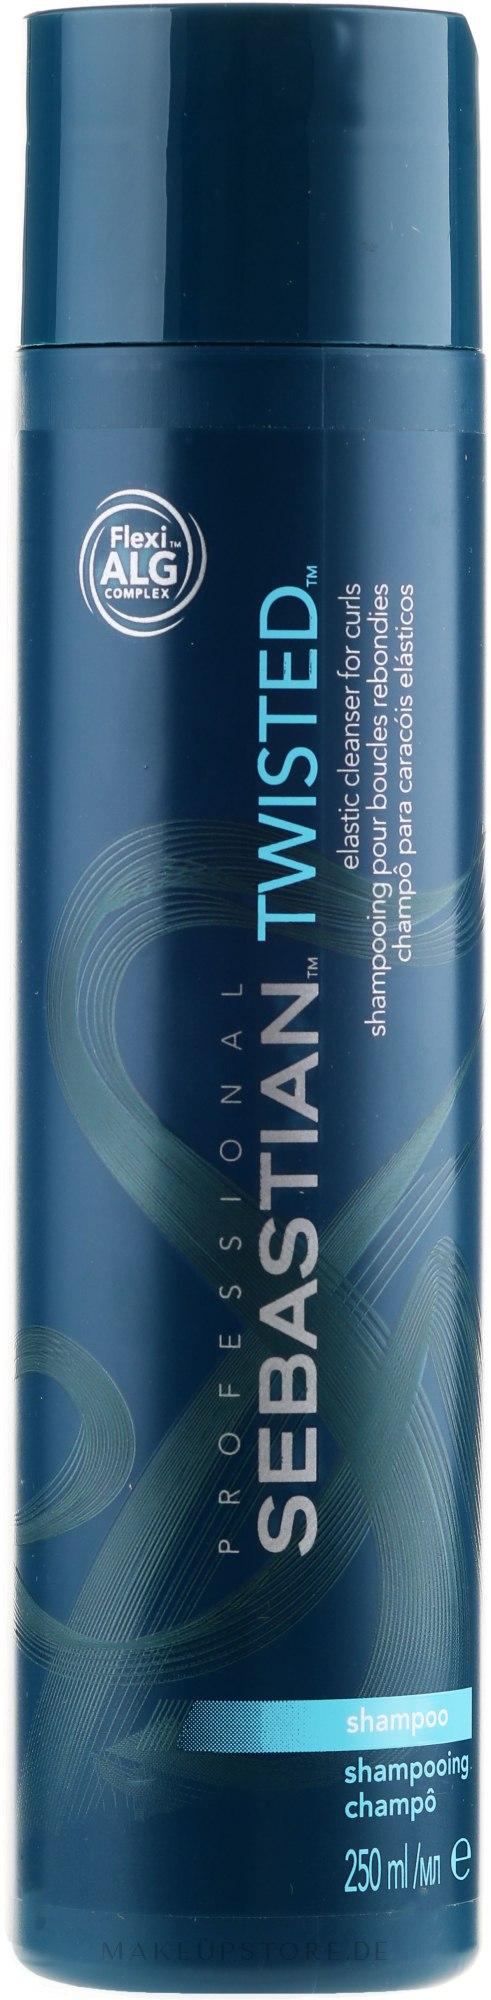 Glättendes Shampoo für lockiges Haar - Sebastian Professional Twisted Elastic Cleanser Shampoo — Bild 1000 ml